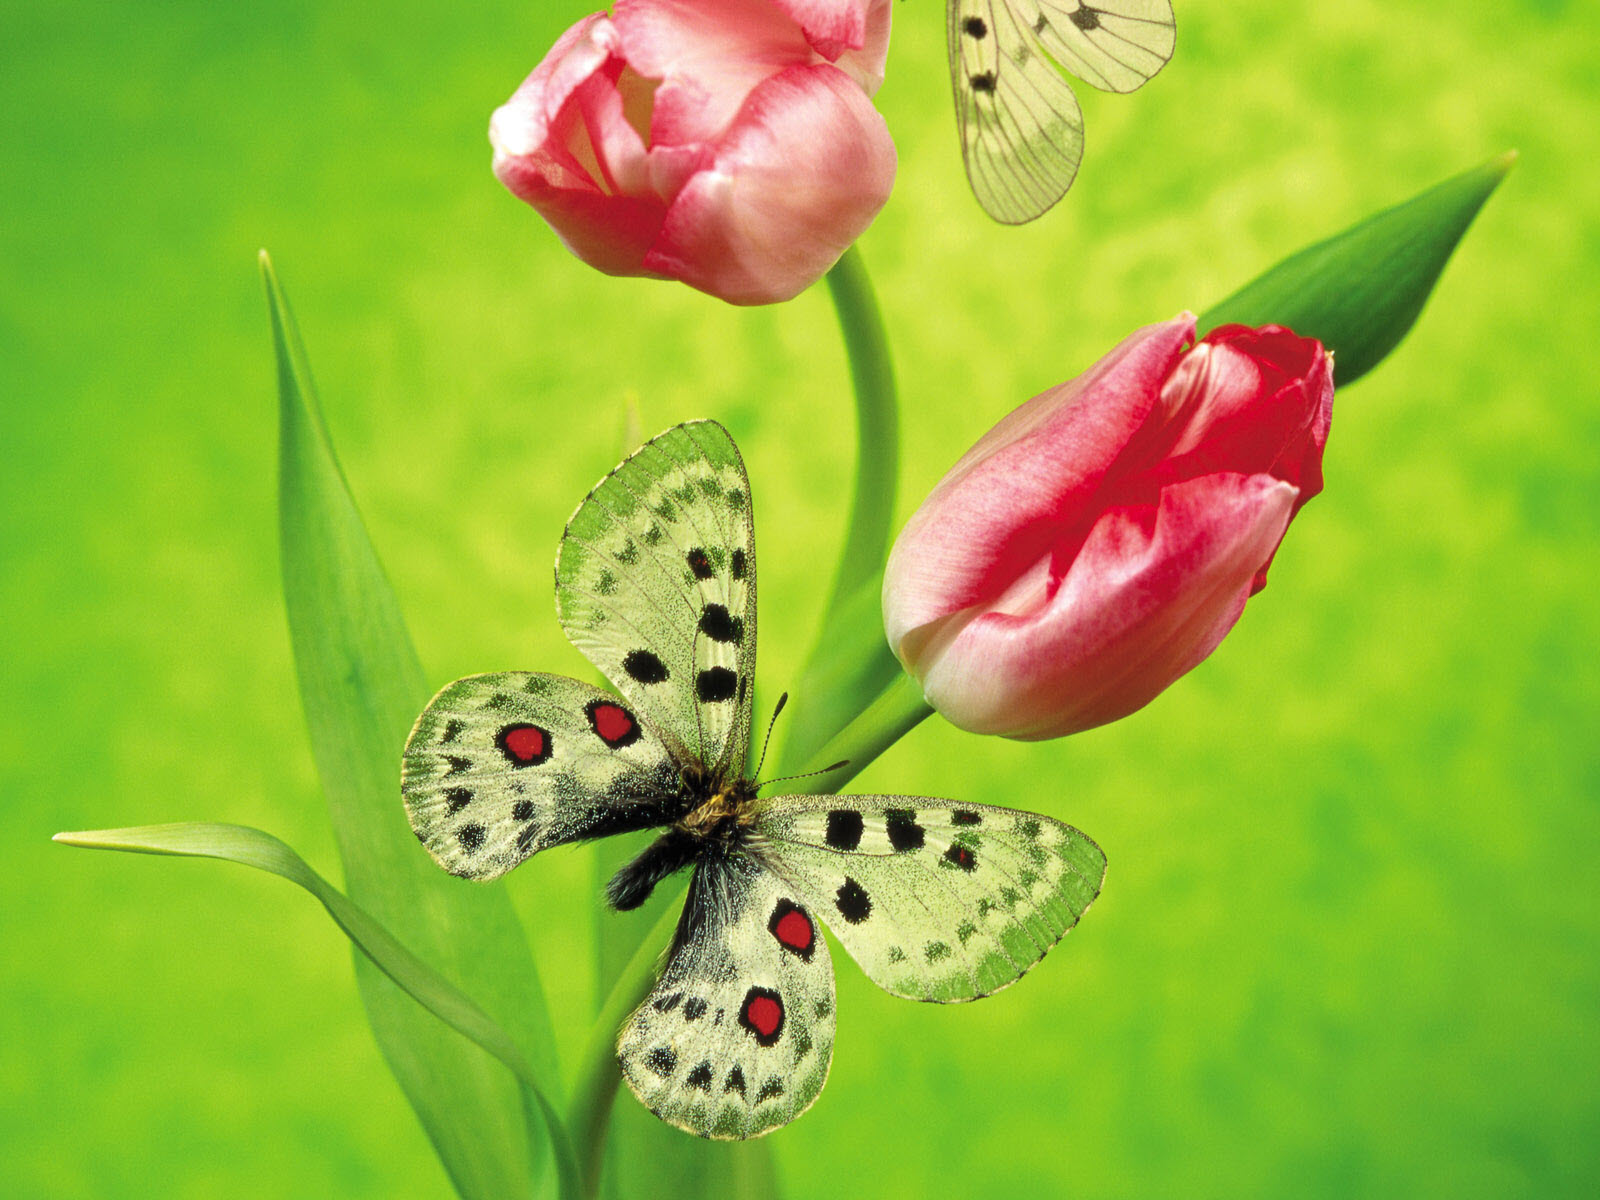 http://2.bp.blogspot.com/-fWlOTCJewHc/T4aOsJeqa8I/AAAAAAAAAcc/u5HbYLzxo5g/s1600/Flowers-Buds-Fly.jpg